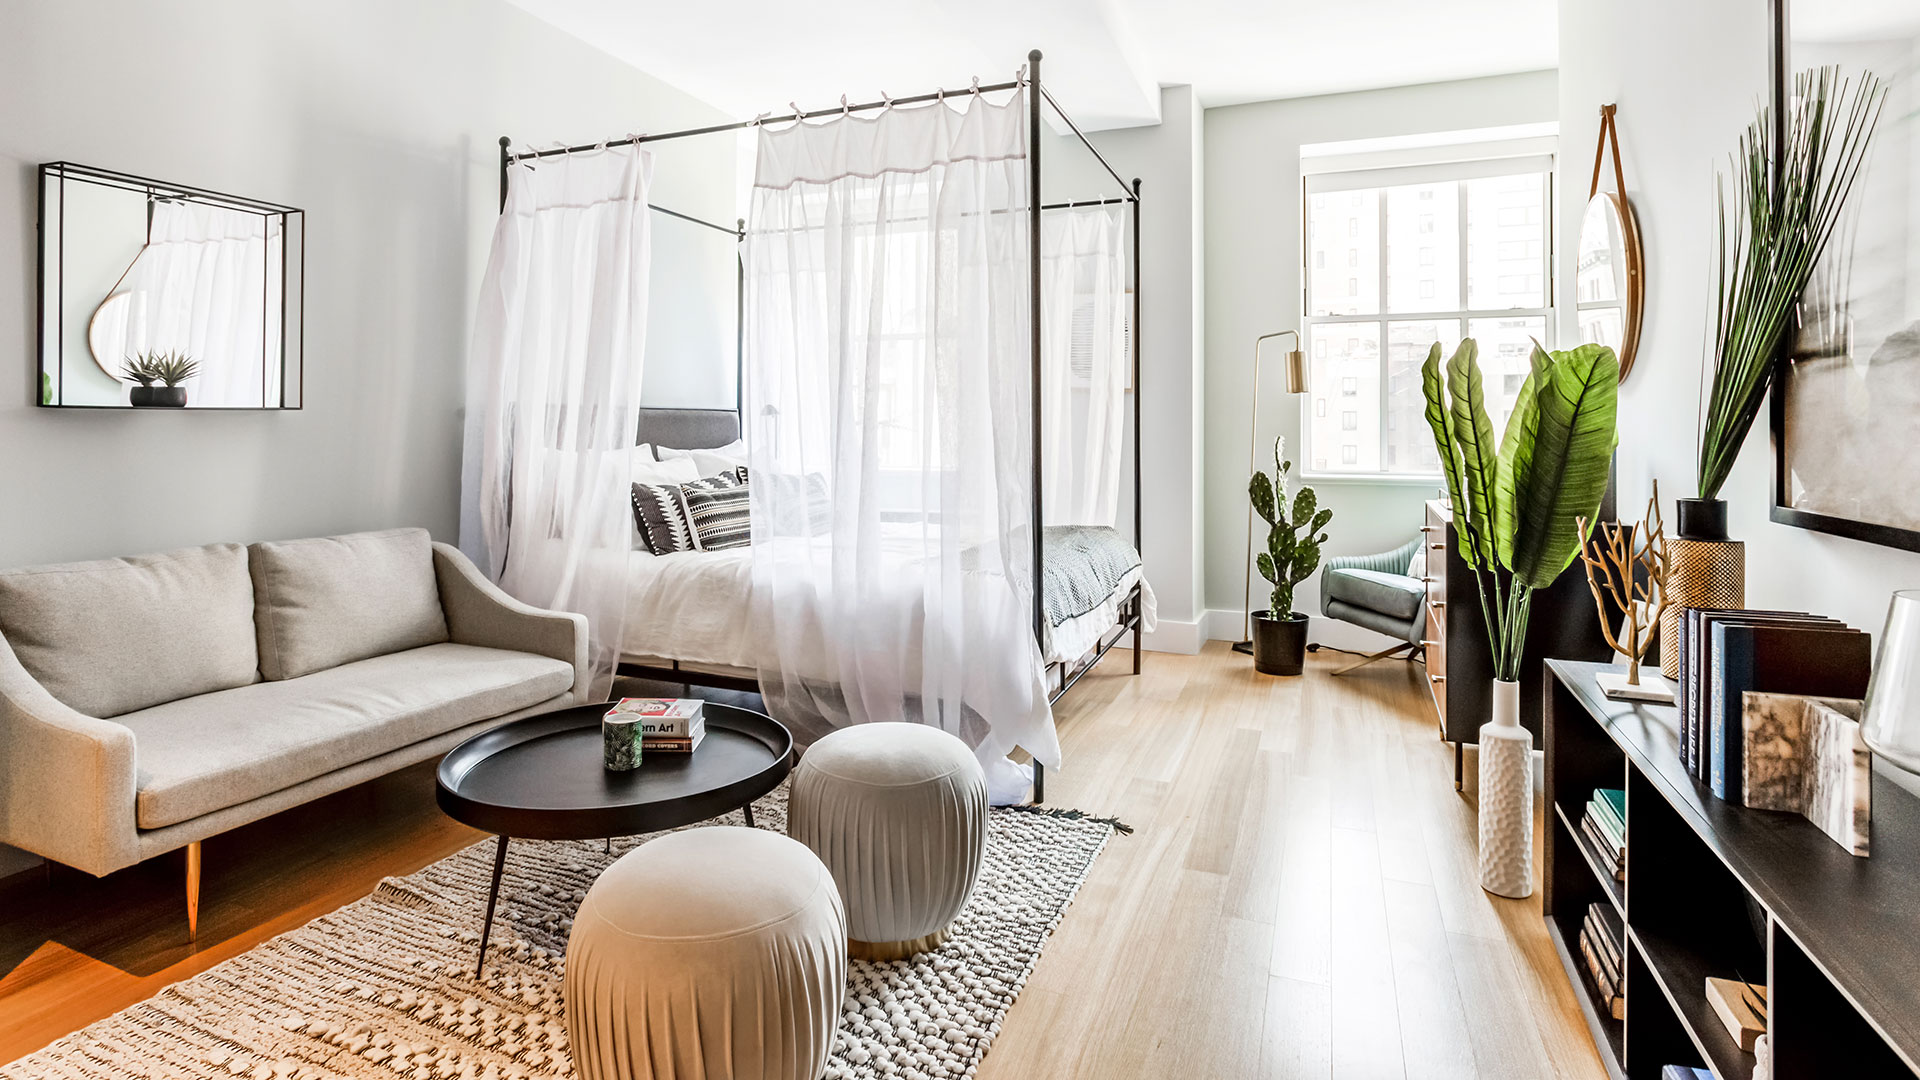 Bedroom-1920×1080.jpg